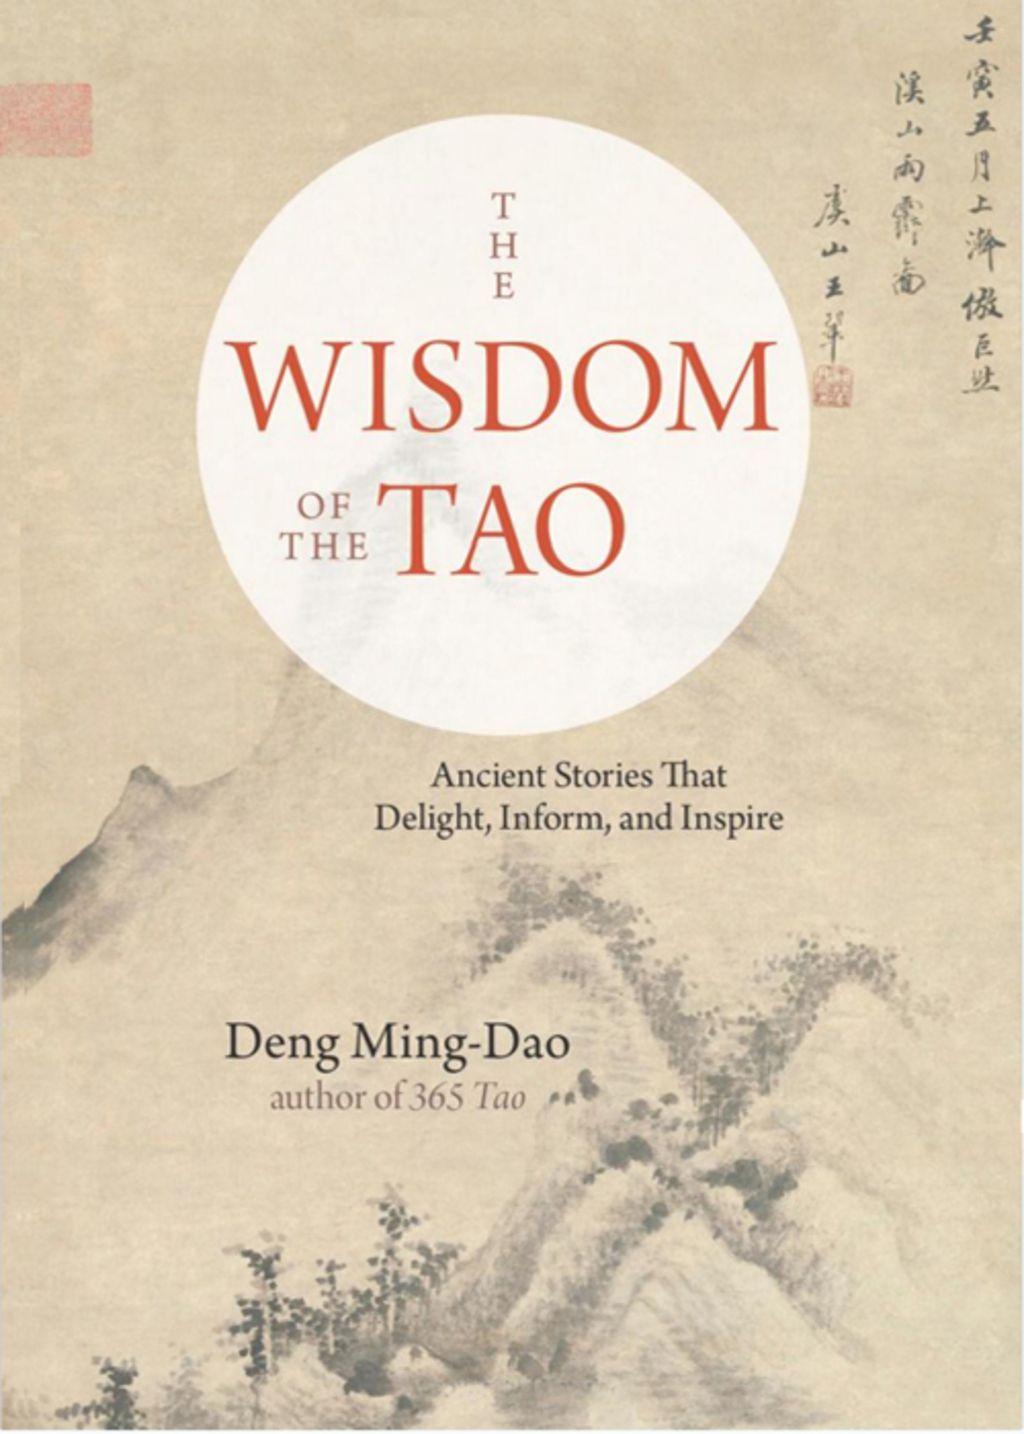 The Wisdom Of The Tao Ebook In 2020 Wisdom Tao Author